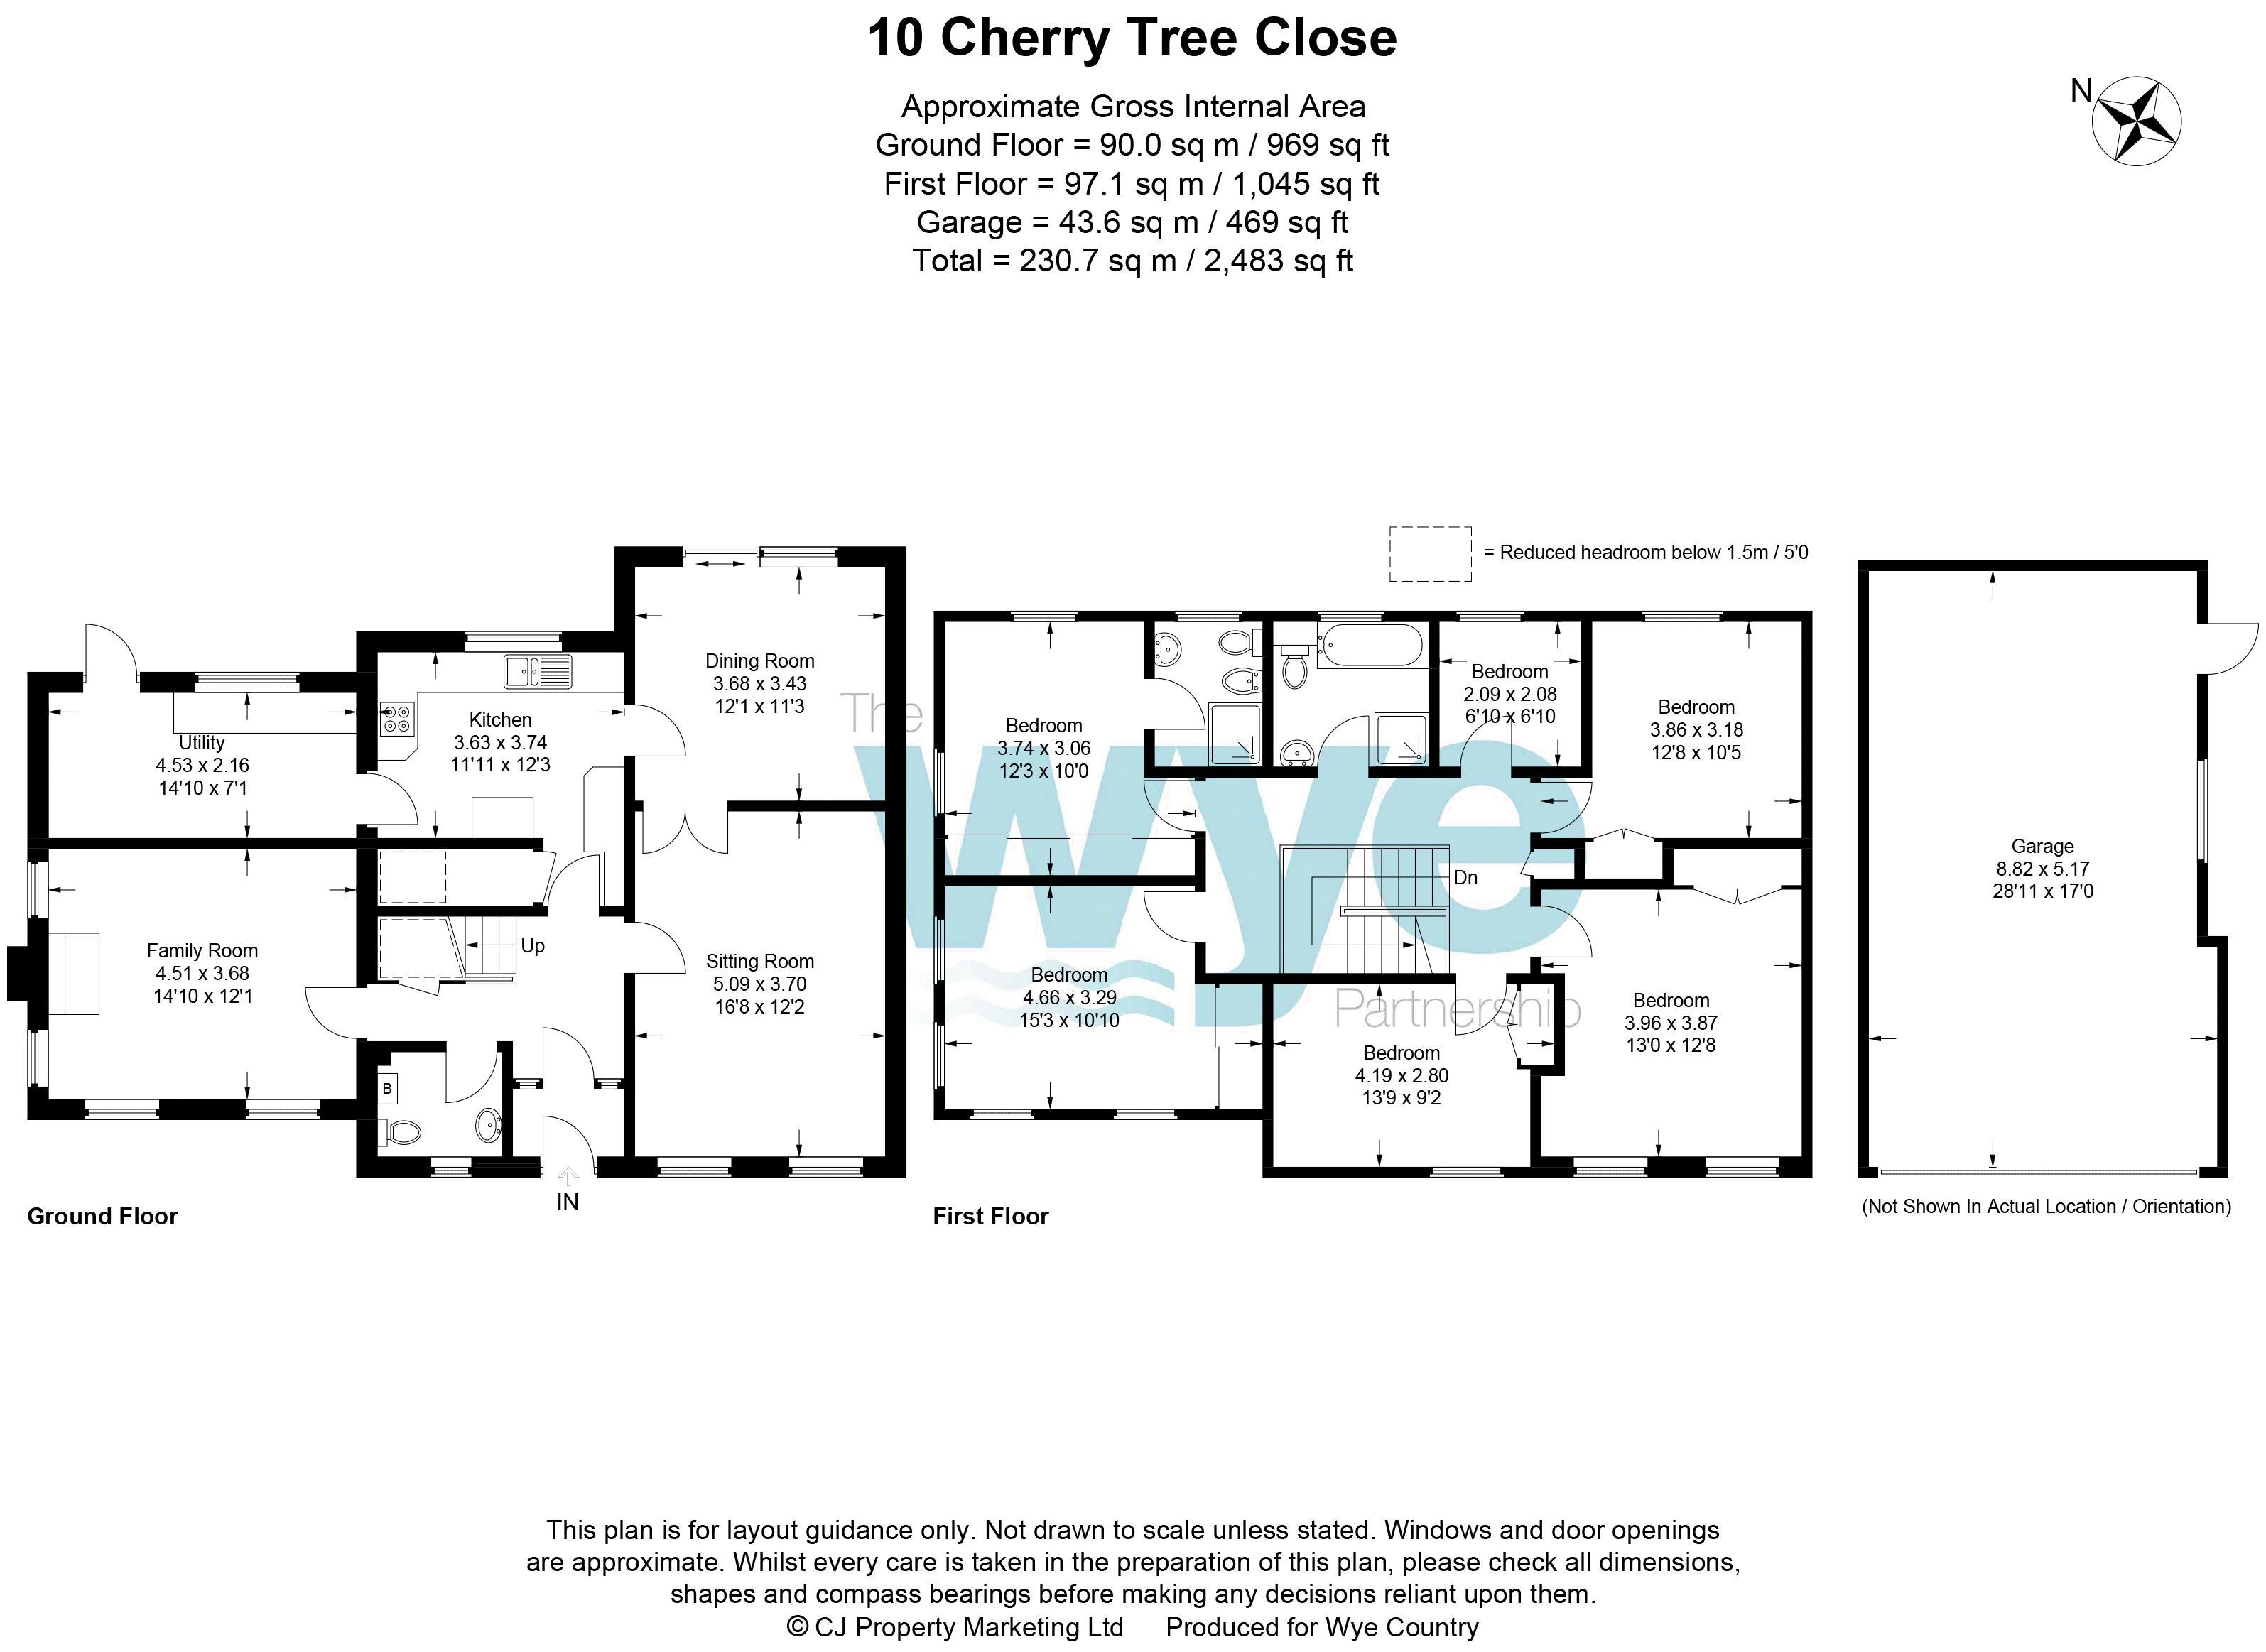 Cherry Tree Close